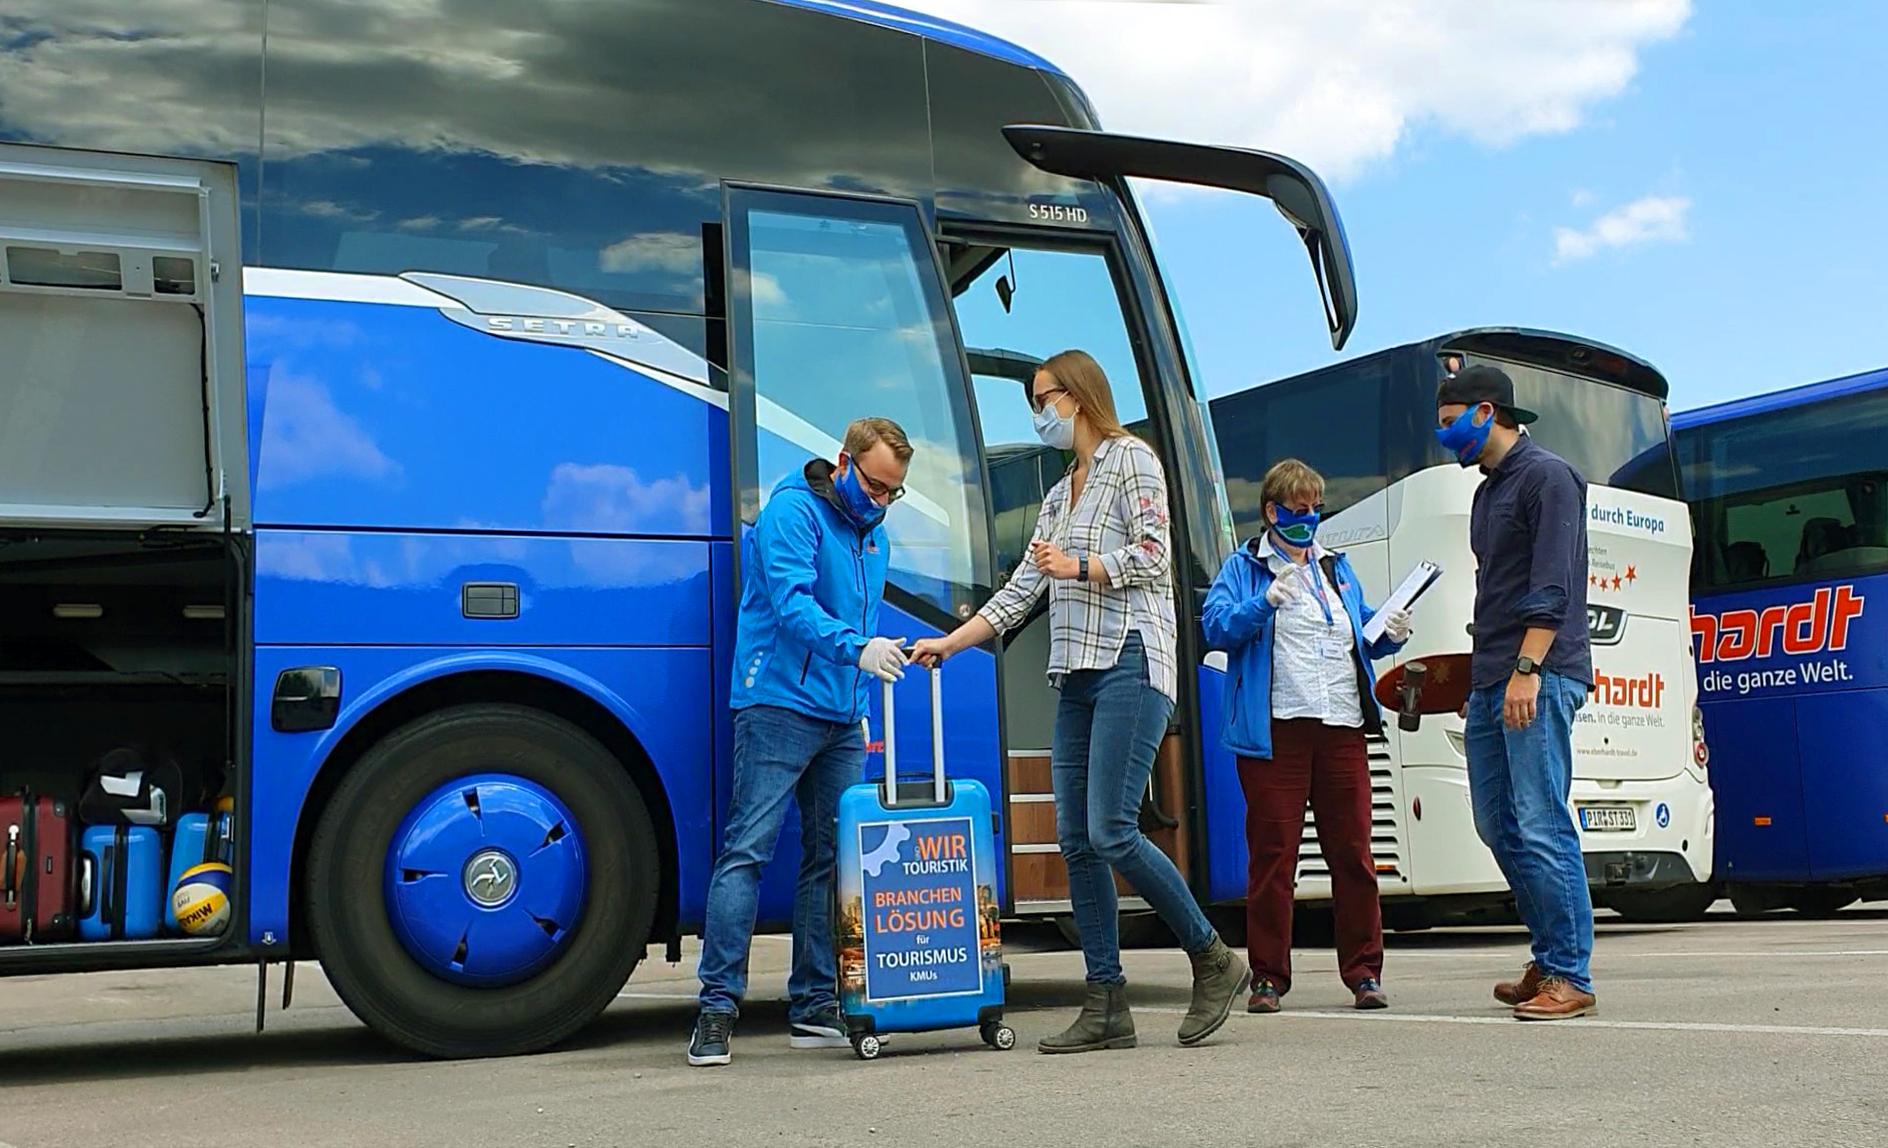 https://assets.eberhardt-travel.de/2020/Newsletter/87833_Busreisen_mit_Corona-Schutzmassnahmen_Original.jpg